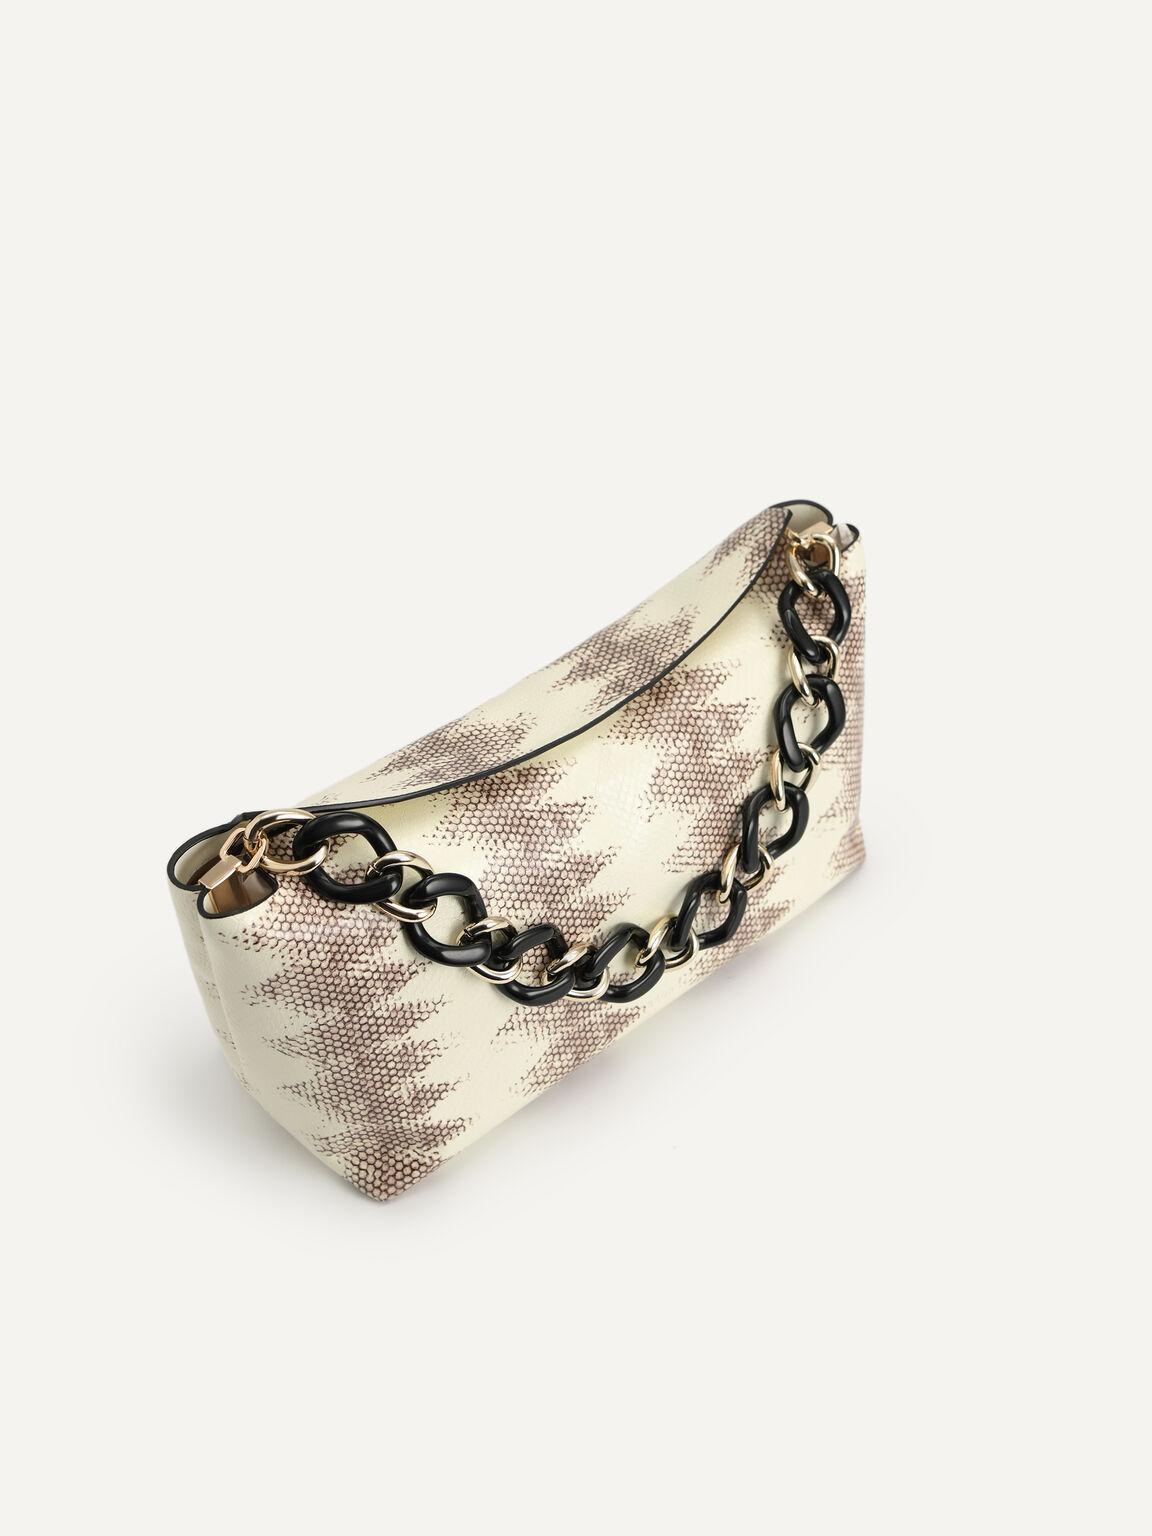 Snake-Effect Leather Hobo Top Handle Bag, Multi, hi-res